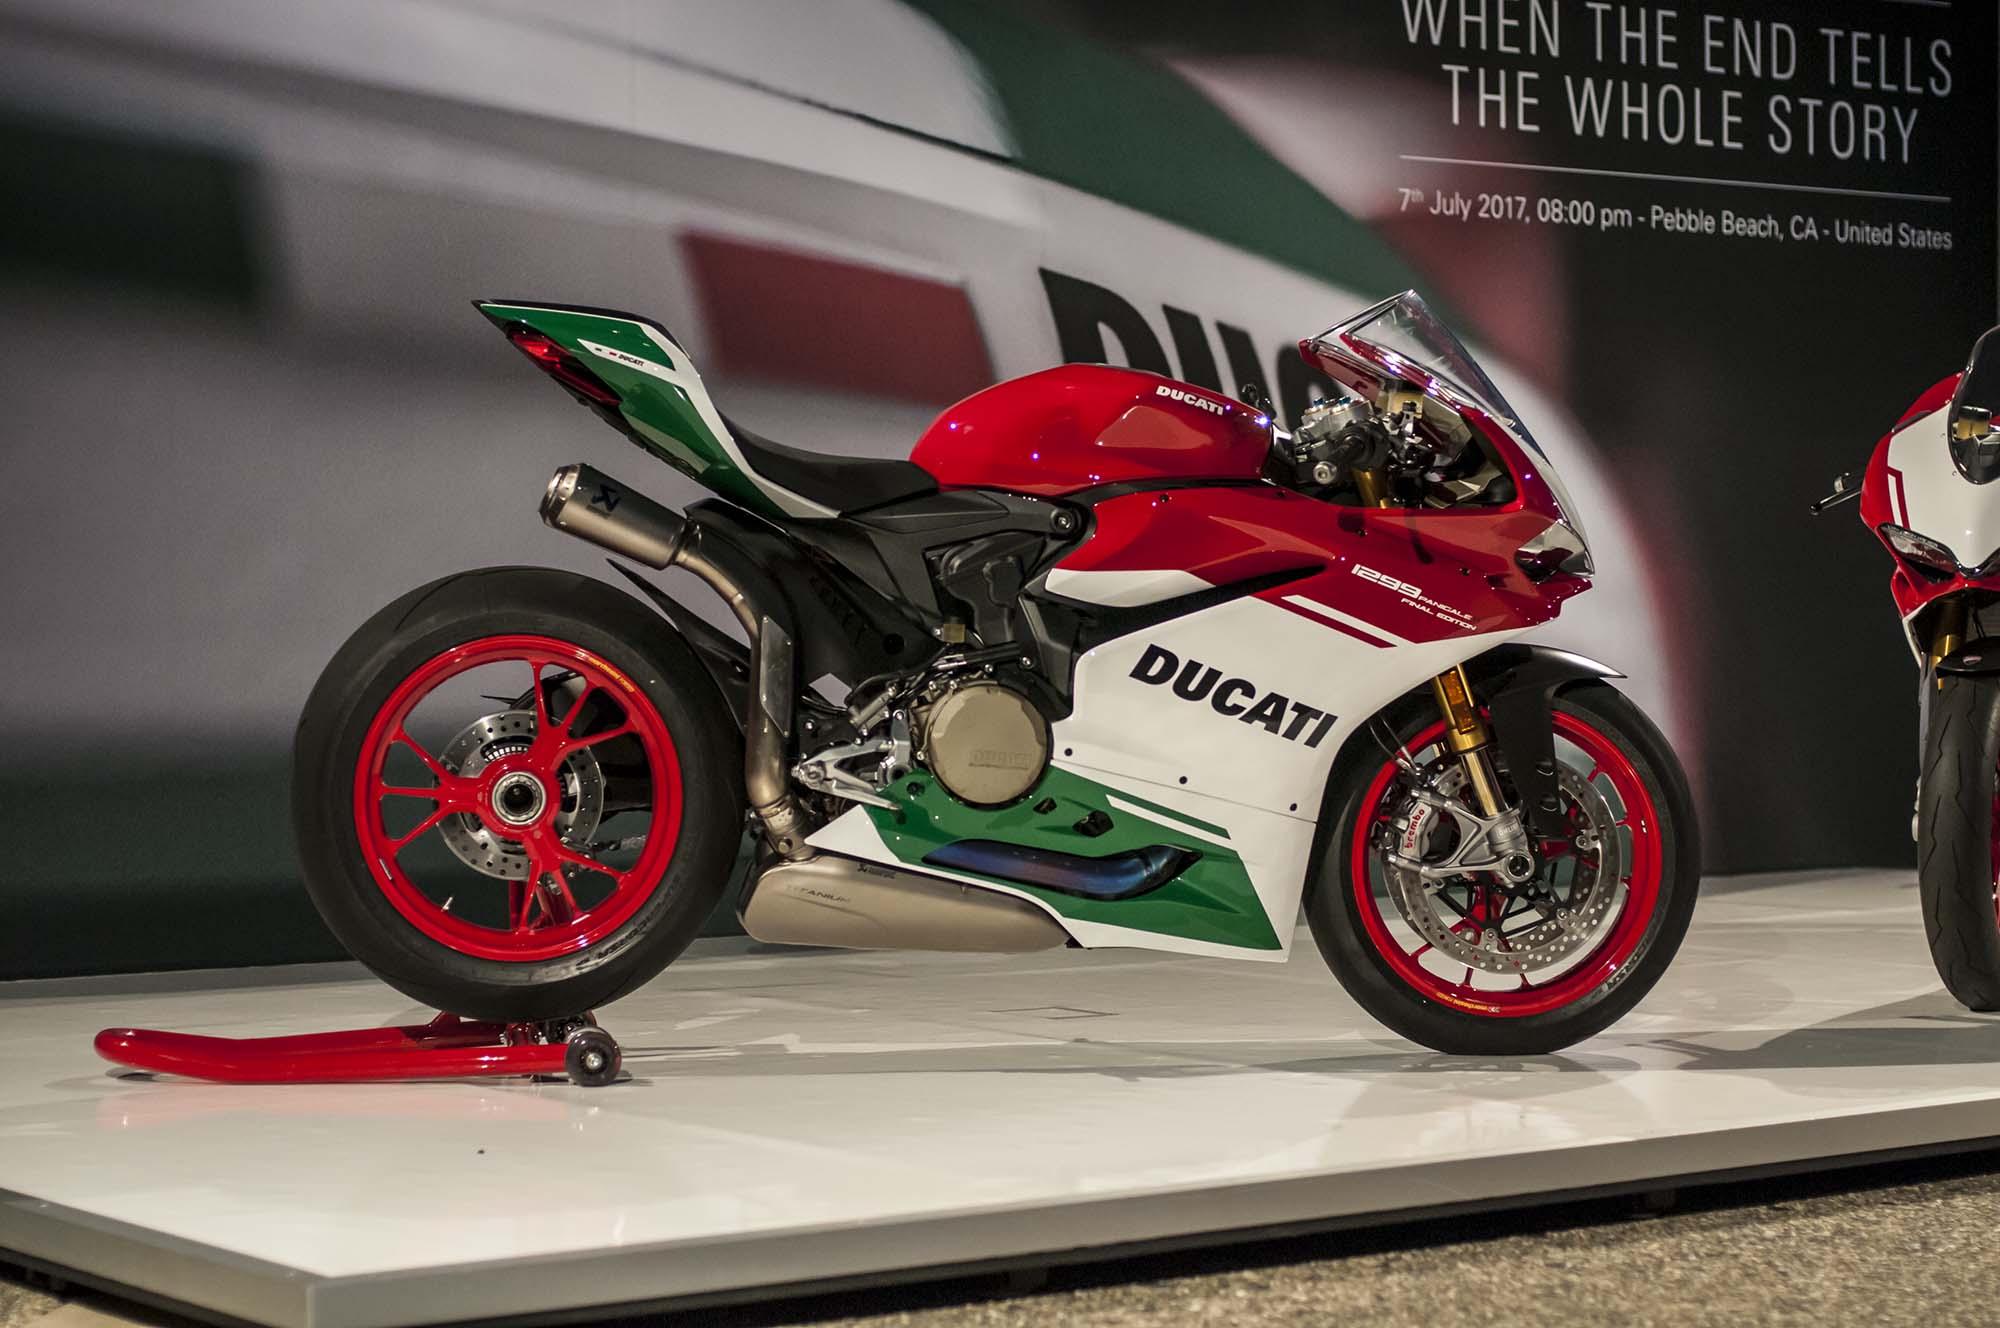 Ducati Close Up Wallpaper